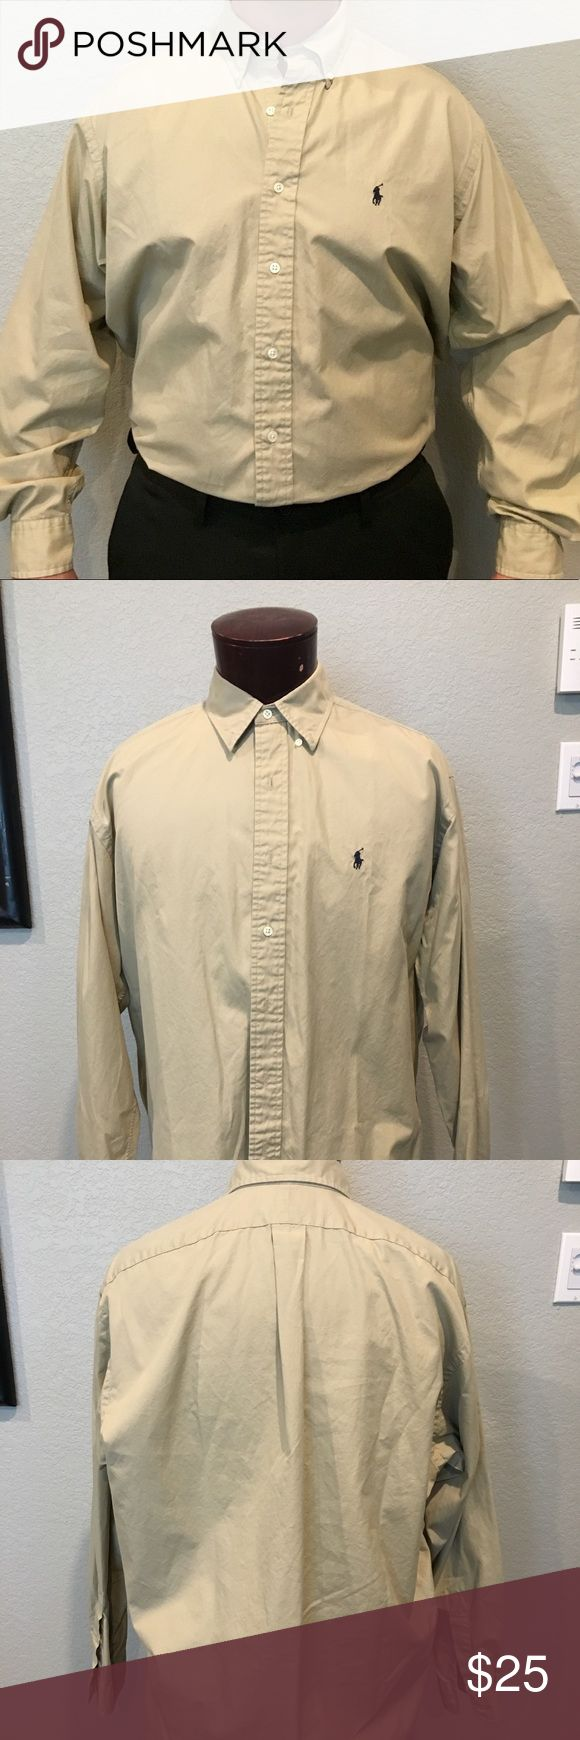 Ralph Lauren dress shirt Nice polo dress shirts! Starched and ready to go. Ralph Lauren Shirts Dress Shirts